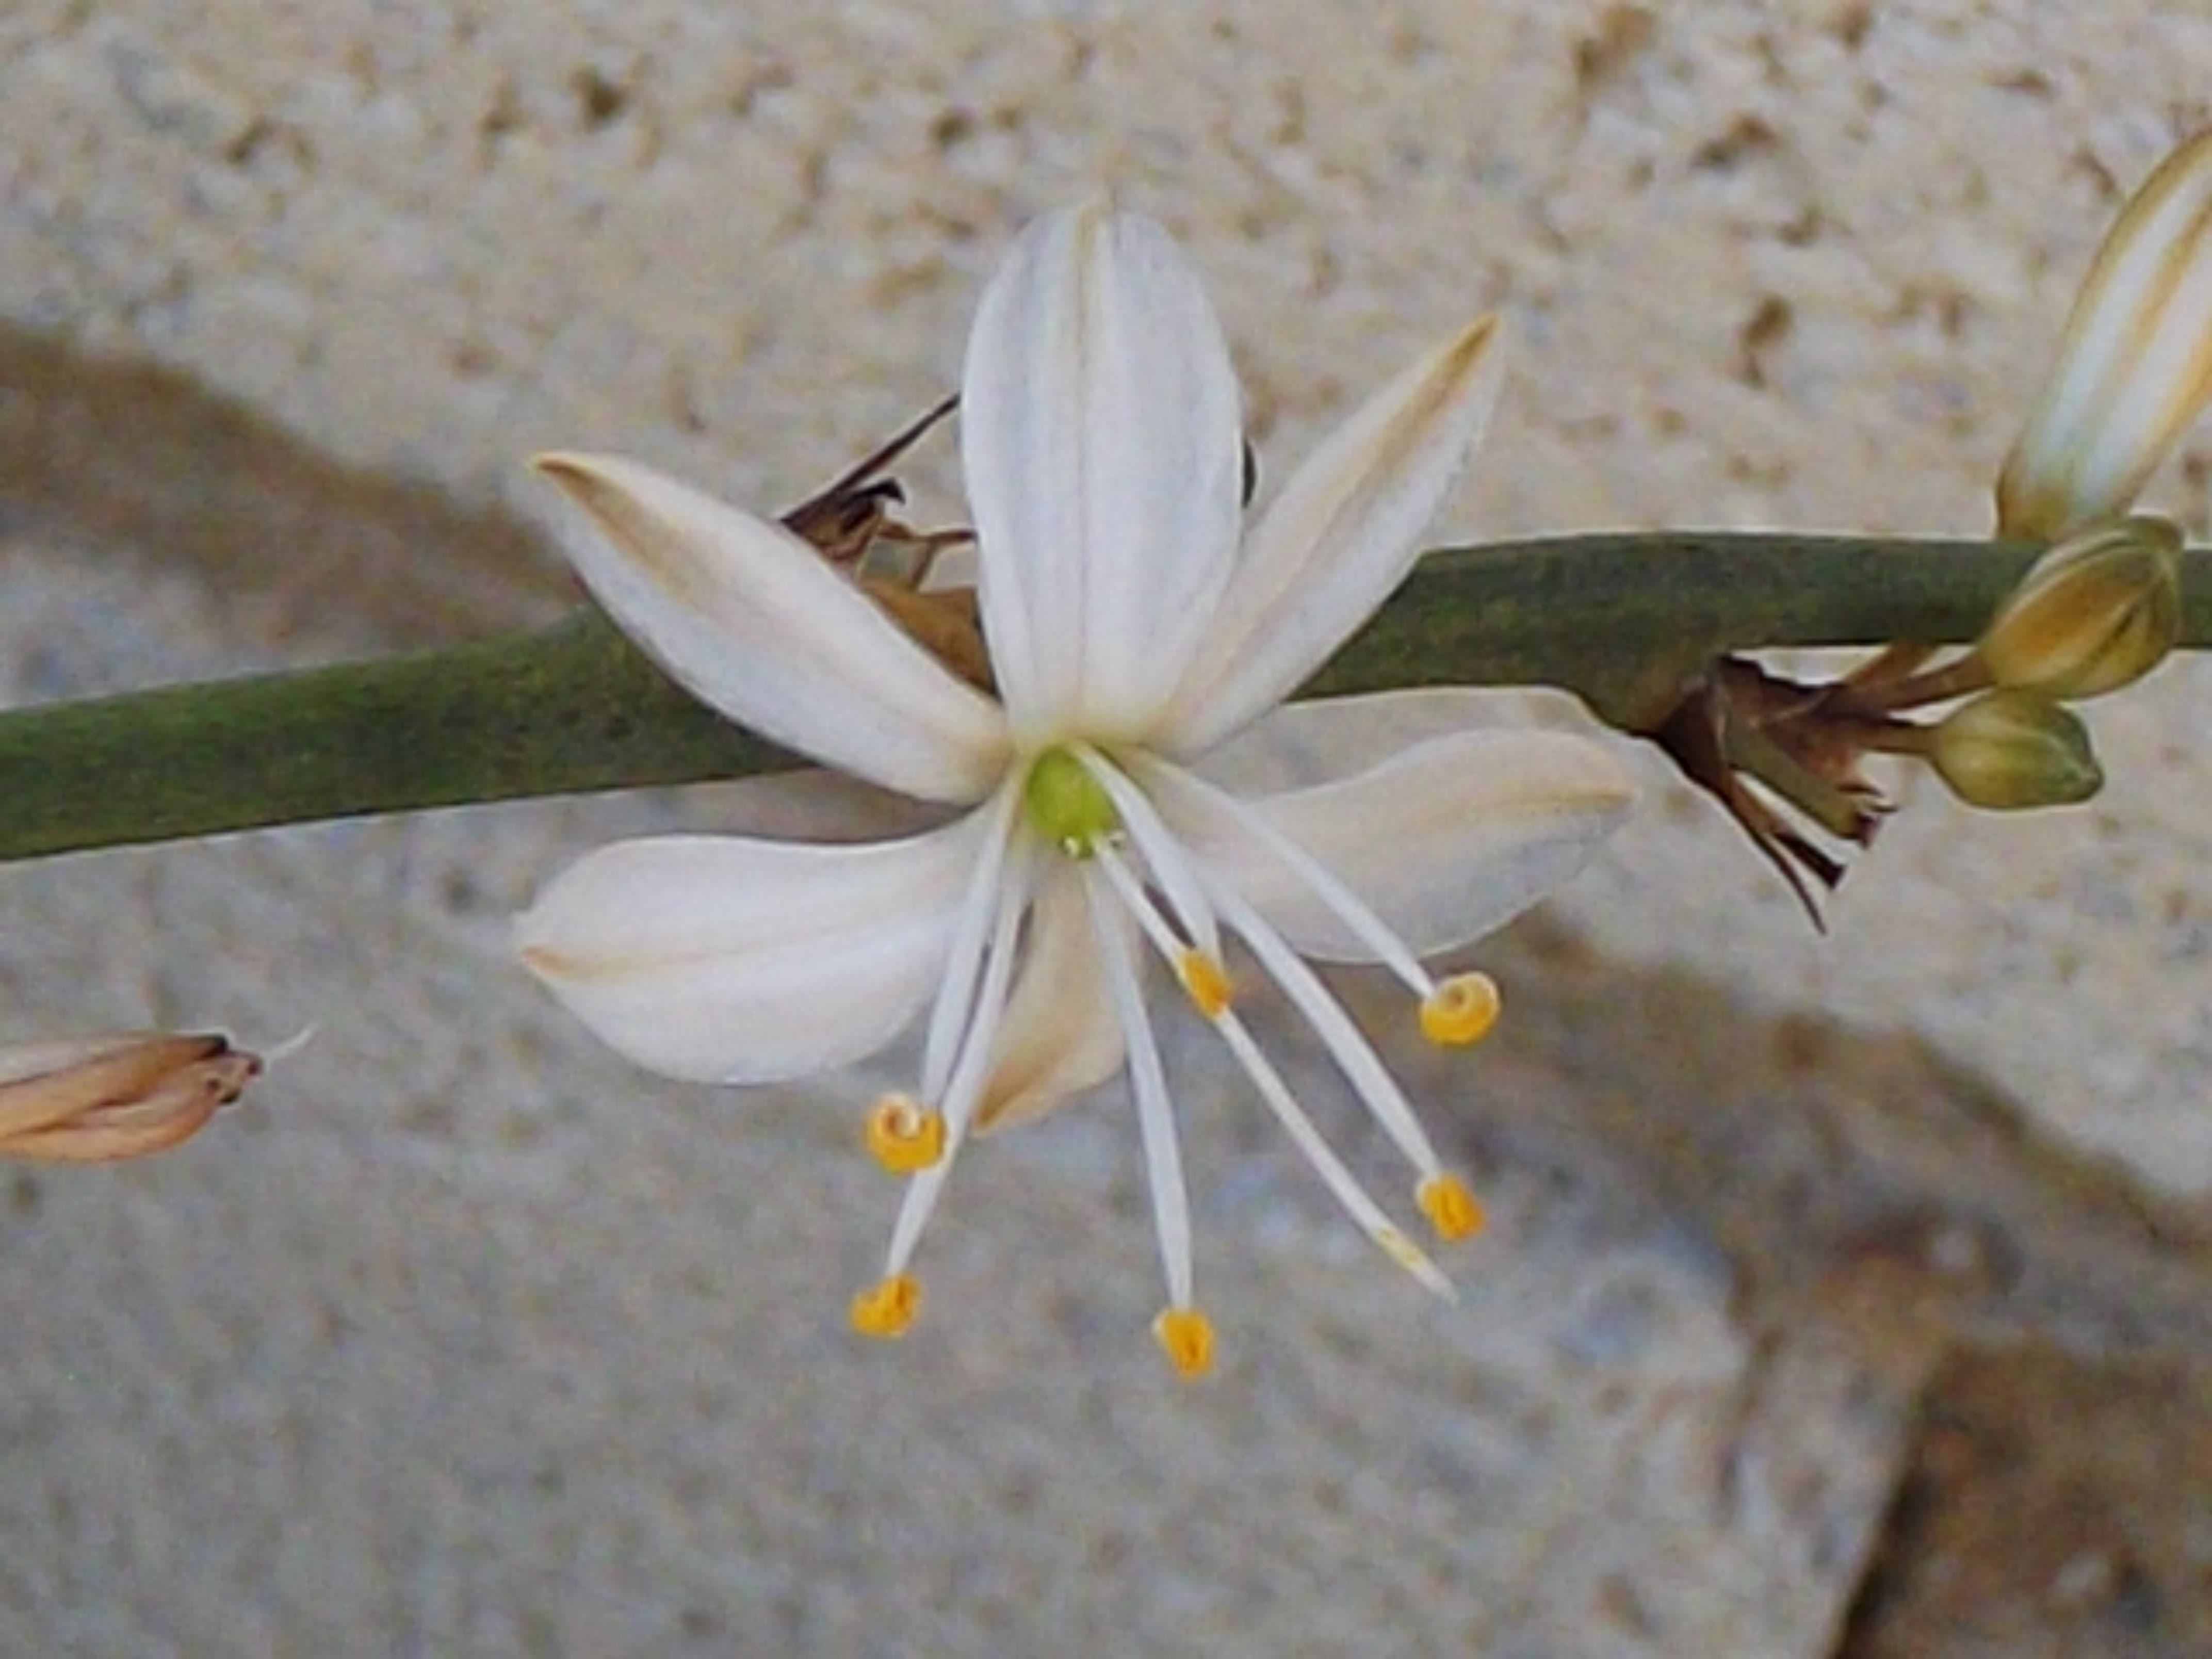 Free stock photo of #nature, flower, petal